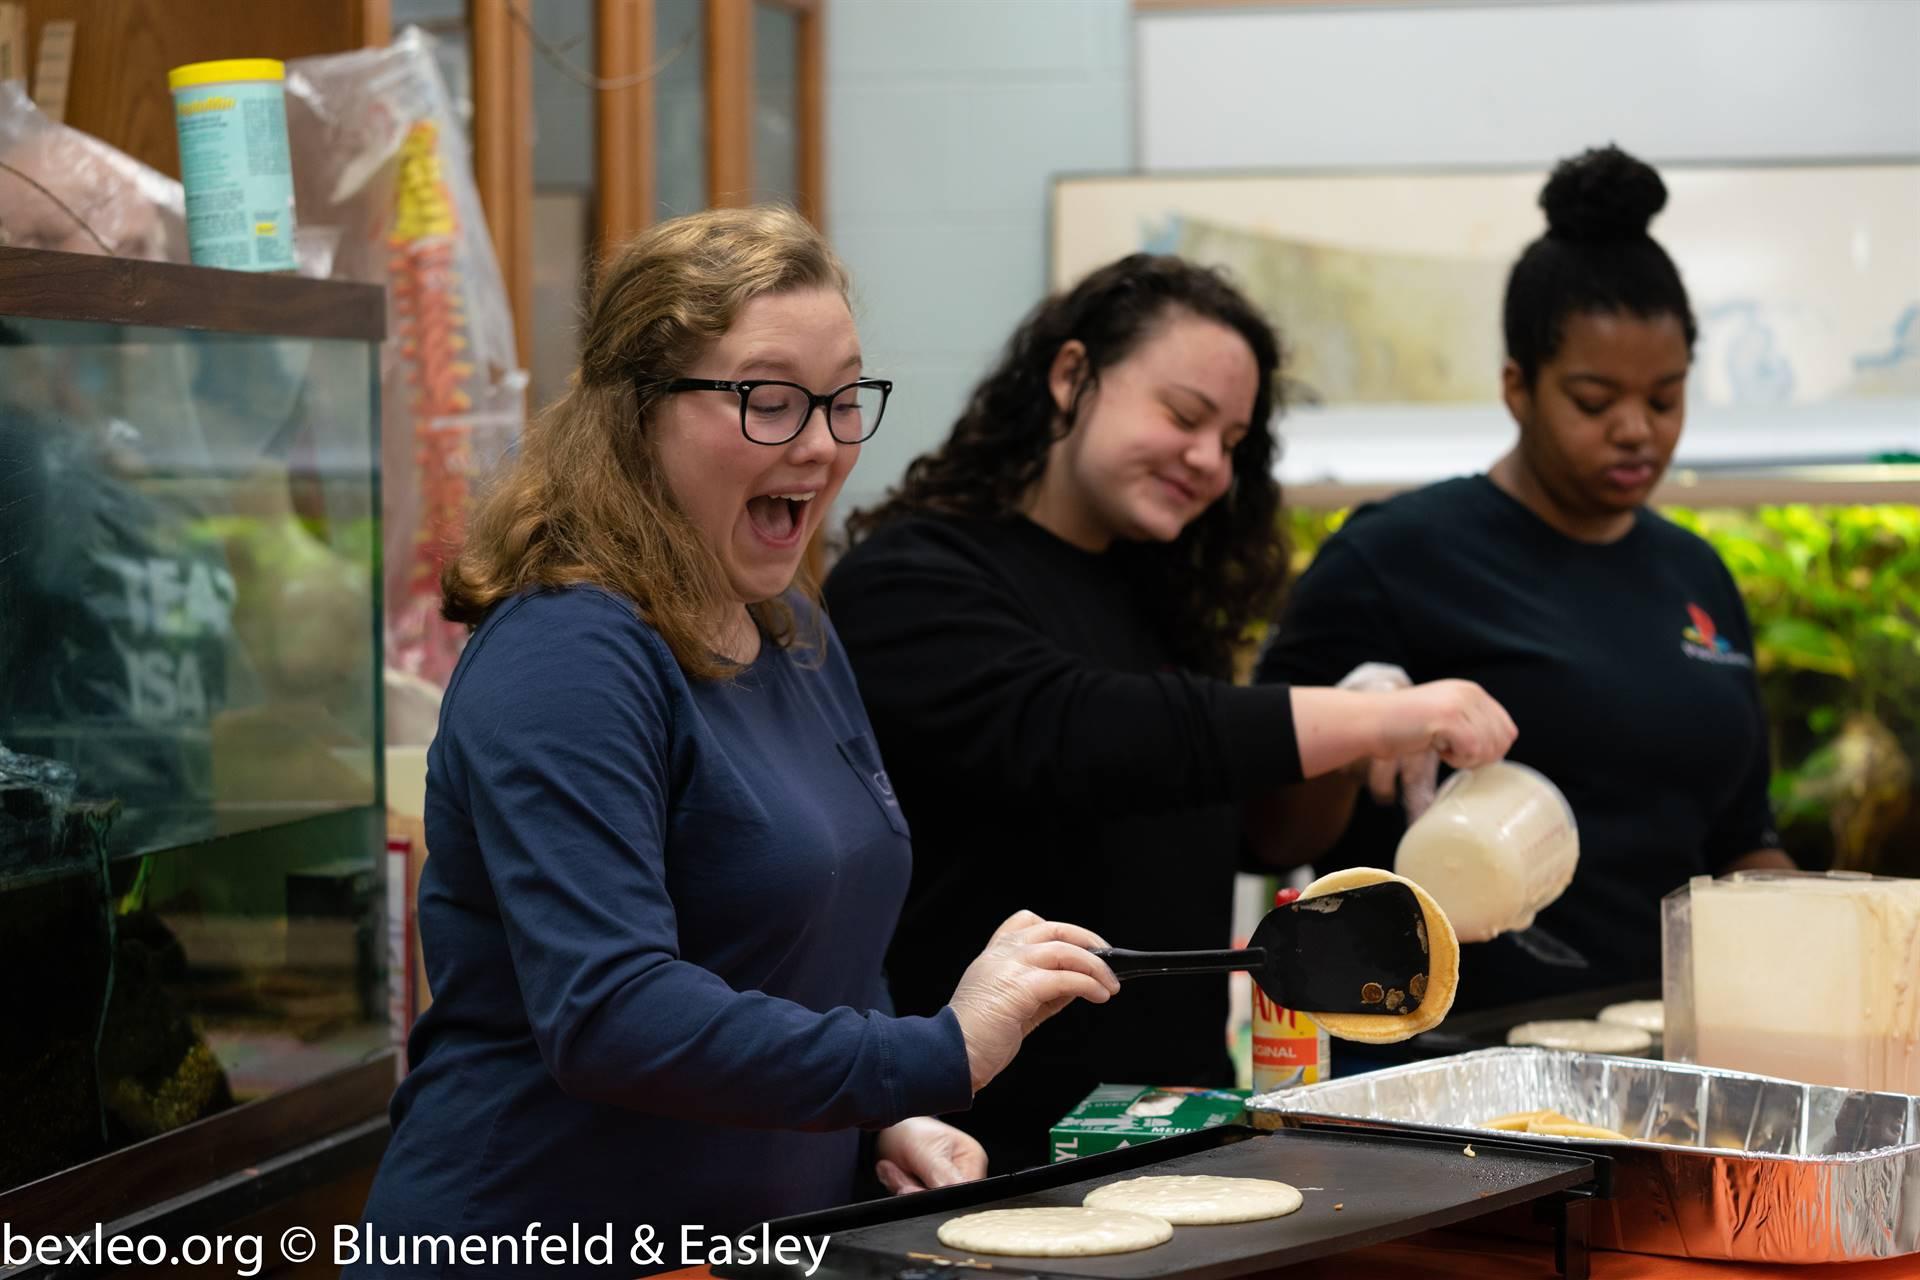 Environmental Club members Elizabeth White, Emma Beckman, and ReJenae Dockery prepare pancakes for t